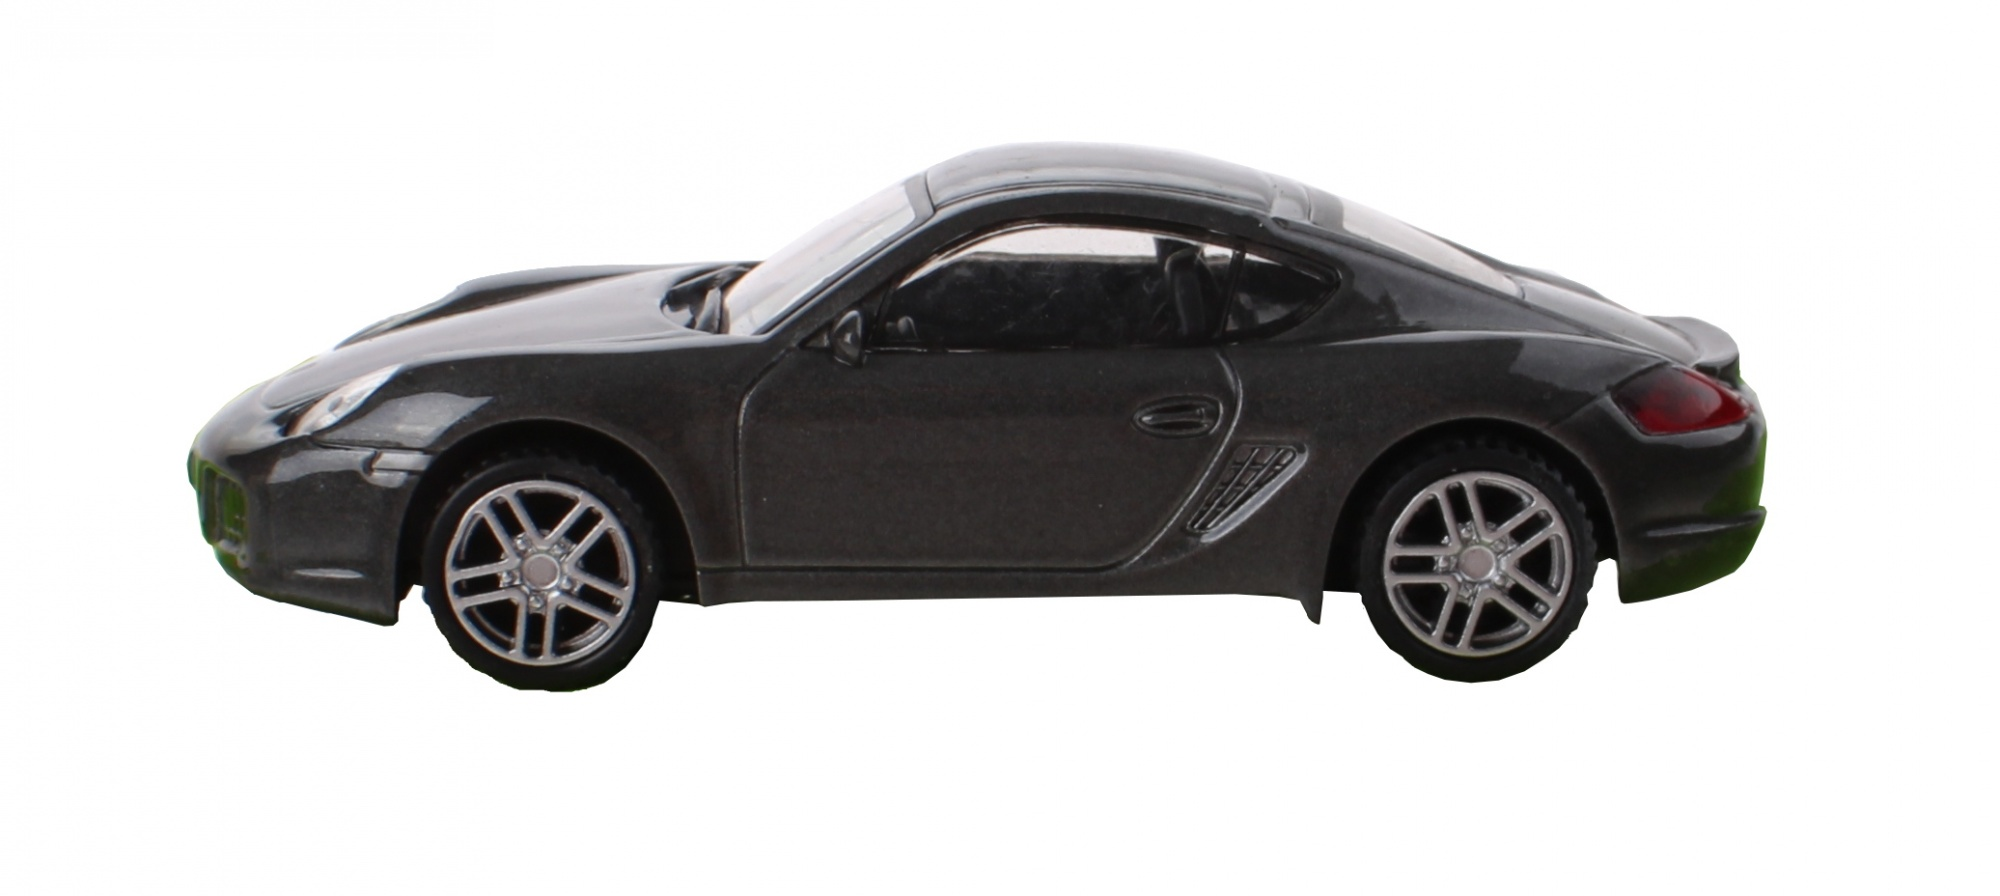 Jonotoys Sportauto Porsche Cayman S Grijs 10 Cm Internet Toys